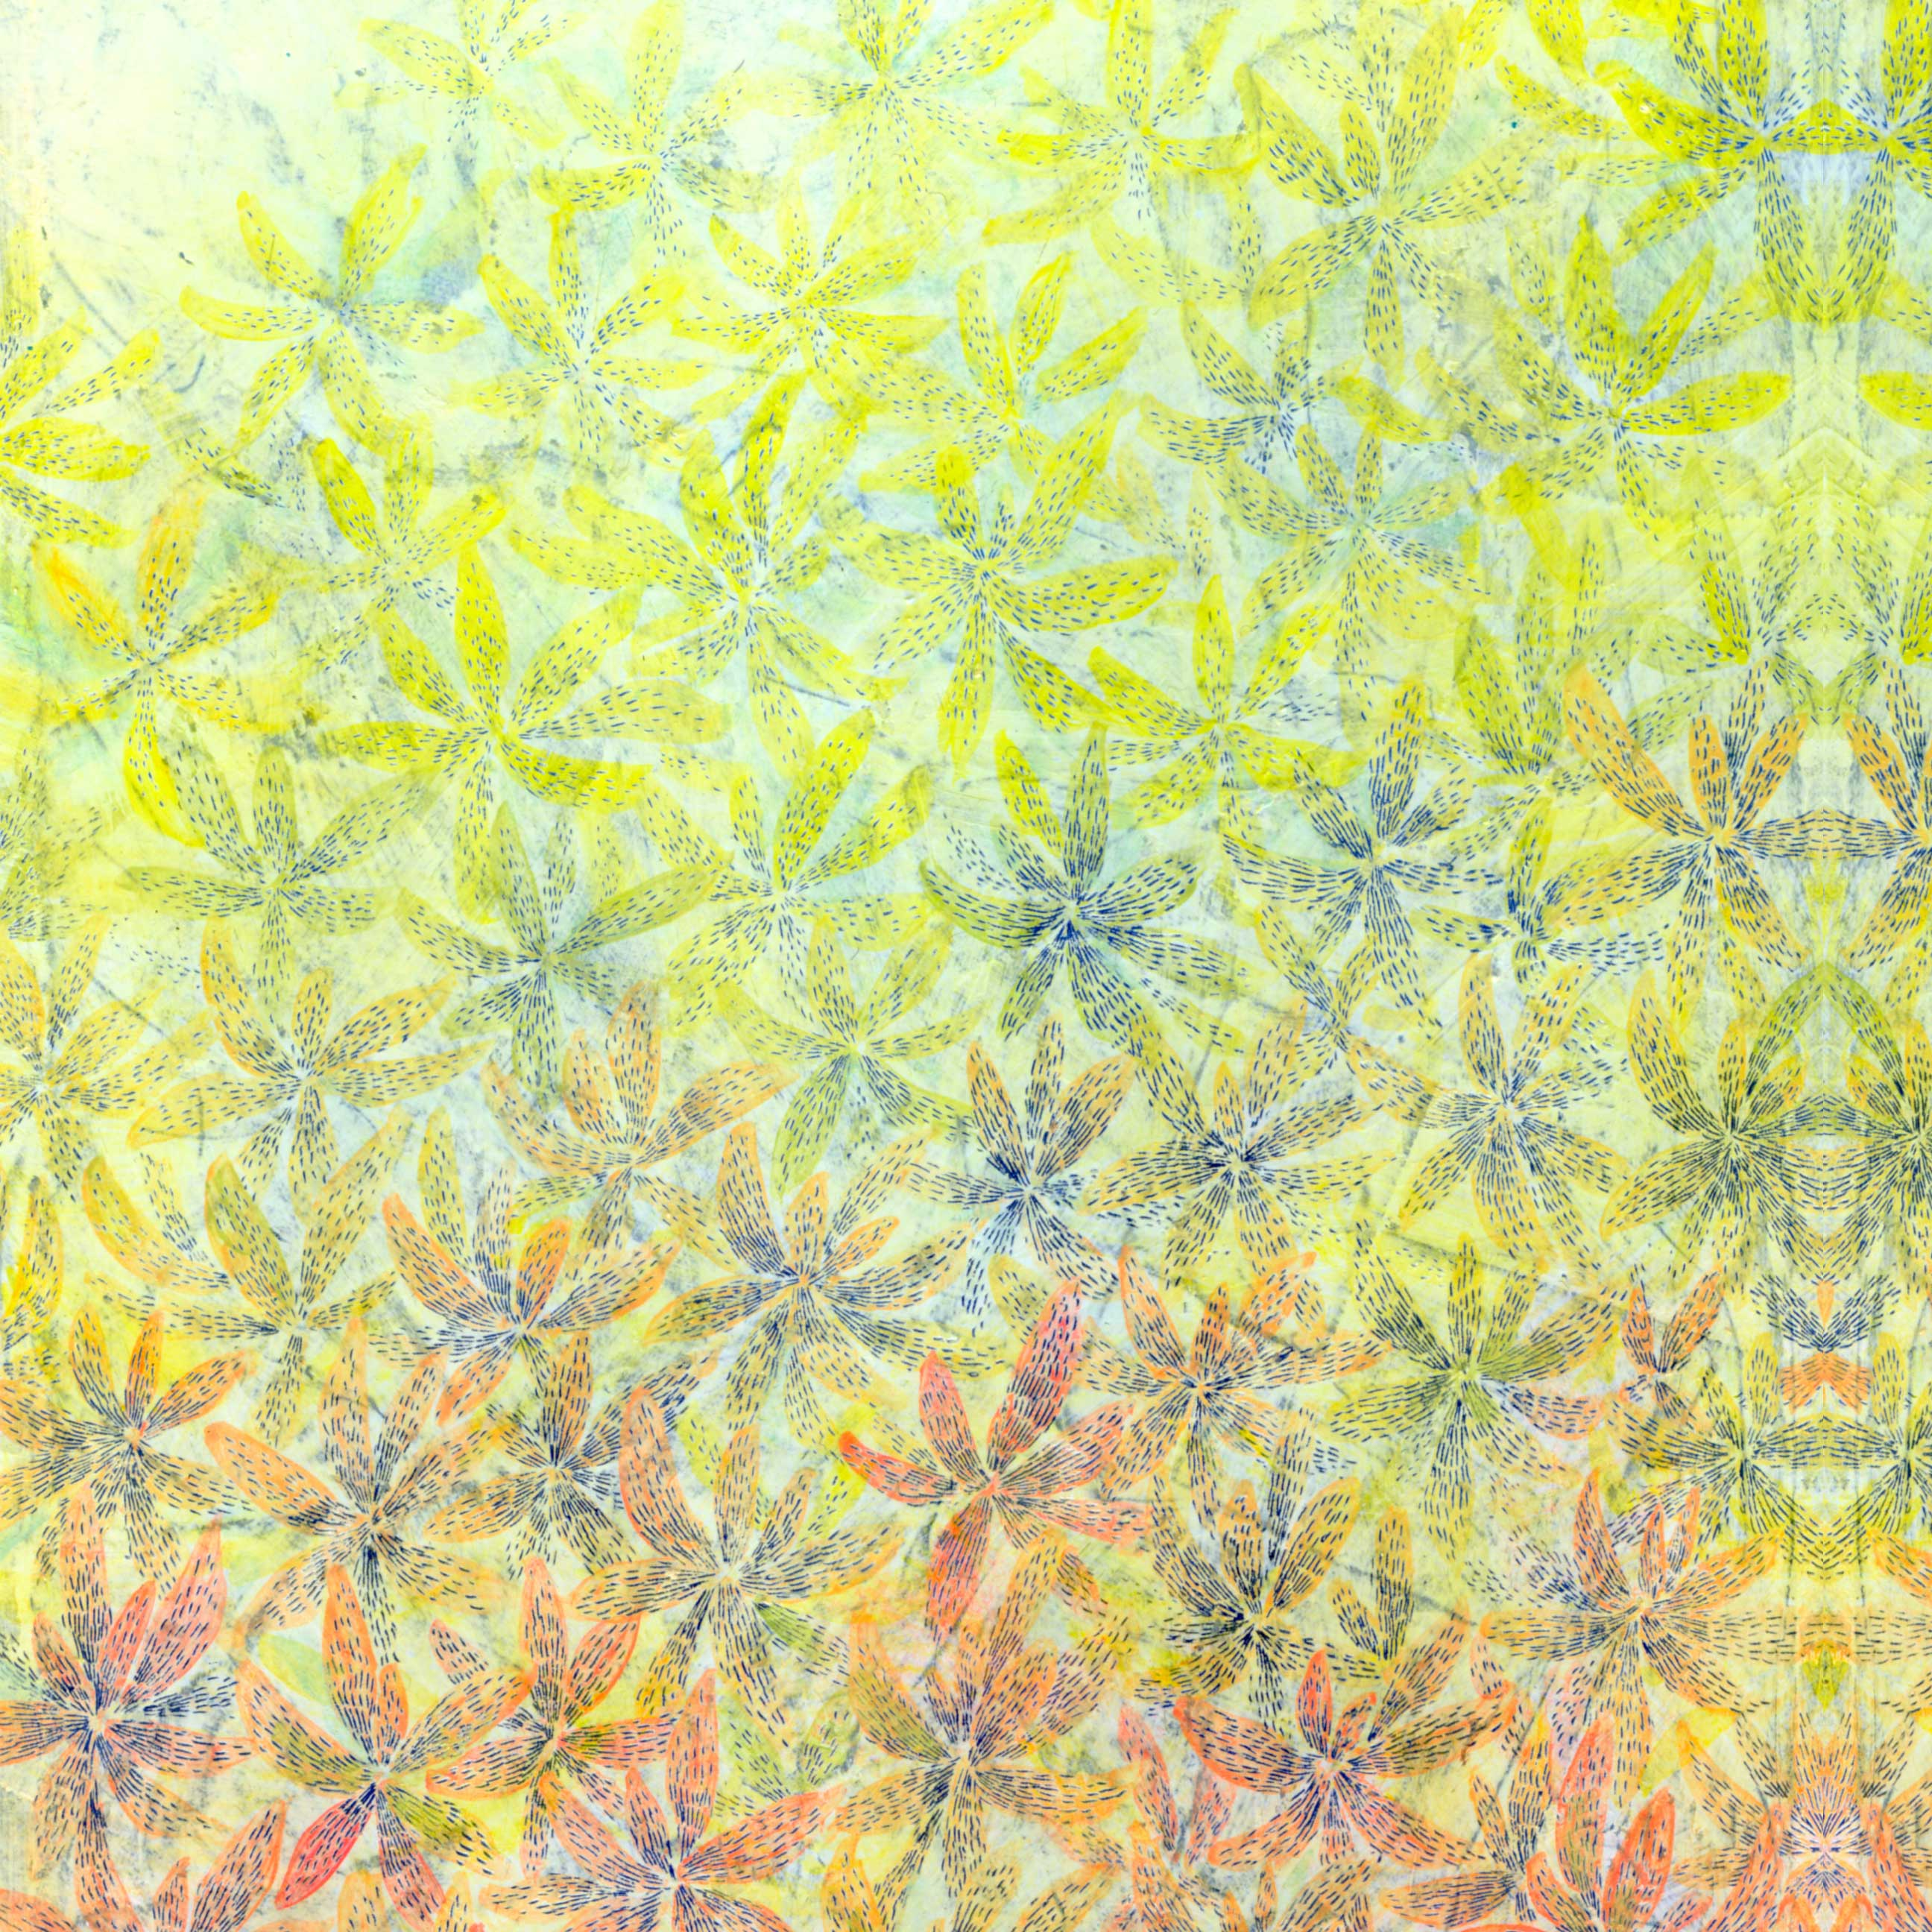 wp yellowpink Planted スマートフォン用壁紙